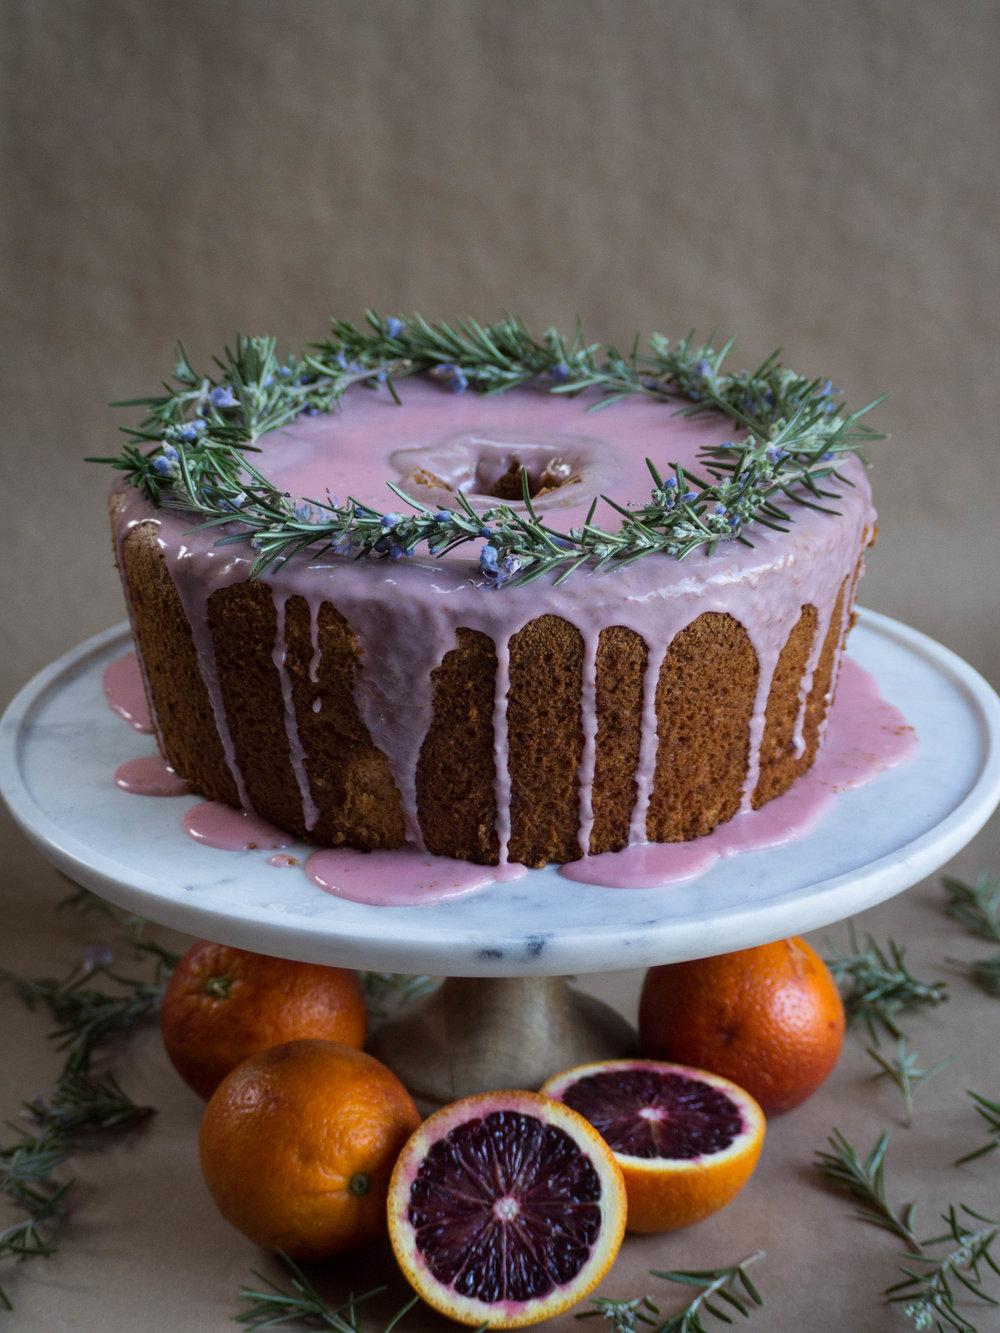 Blood Orange Chiffon Cake